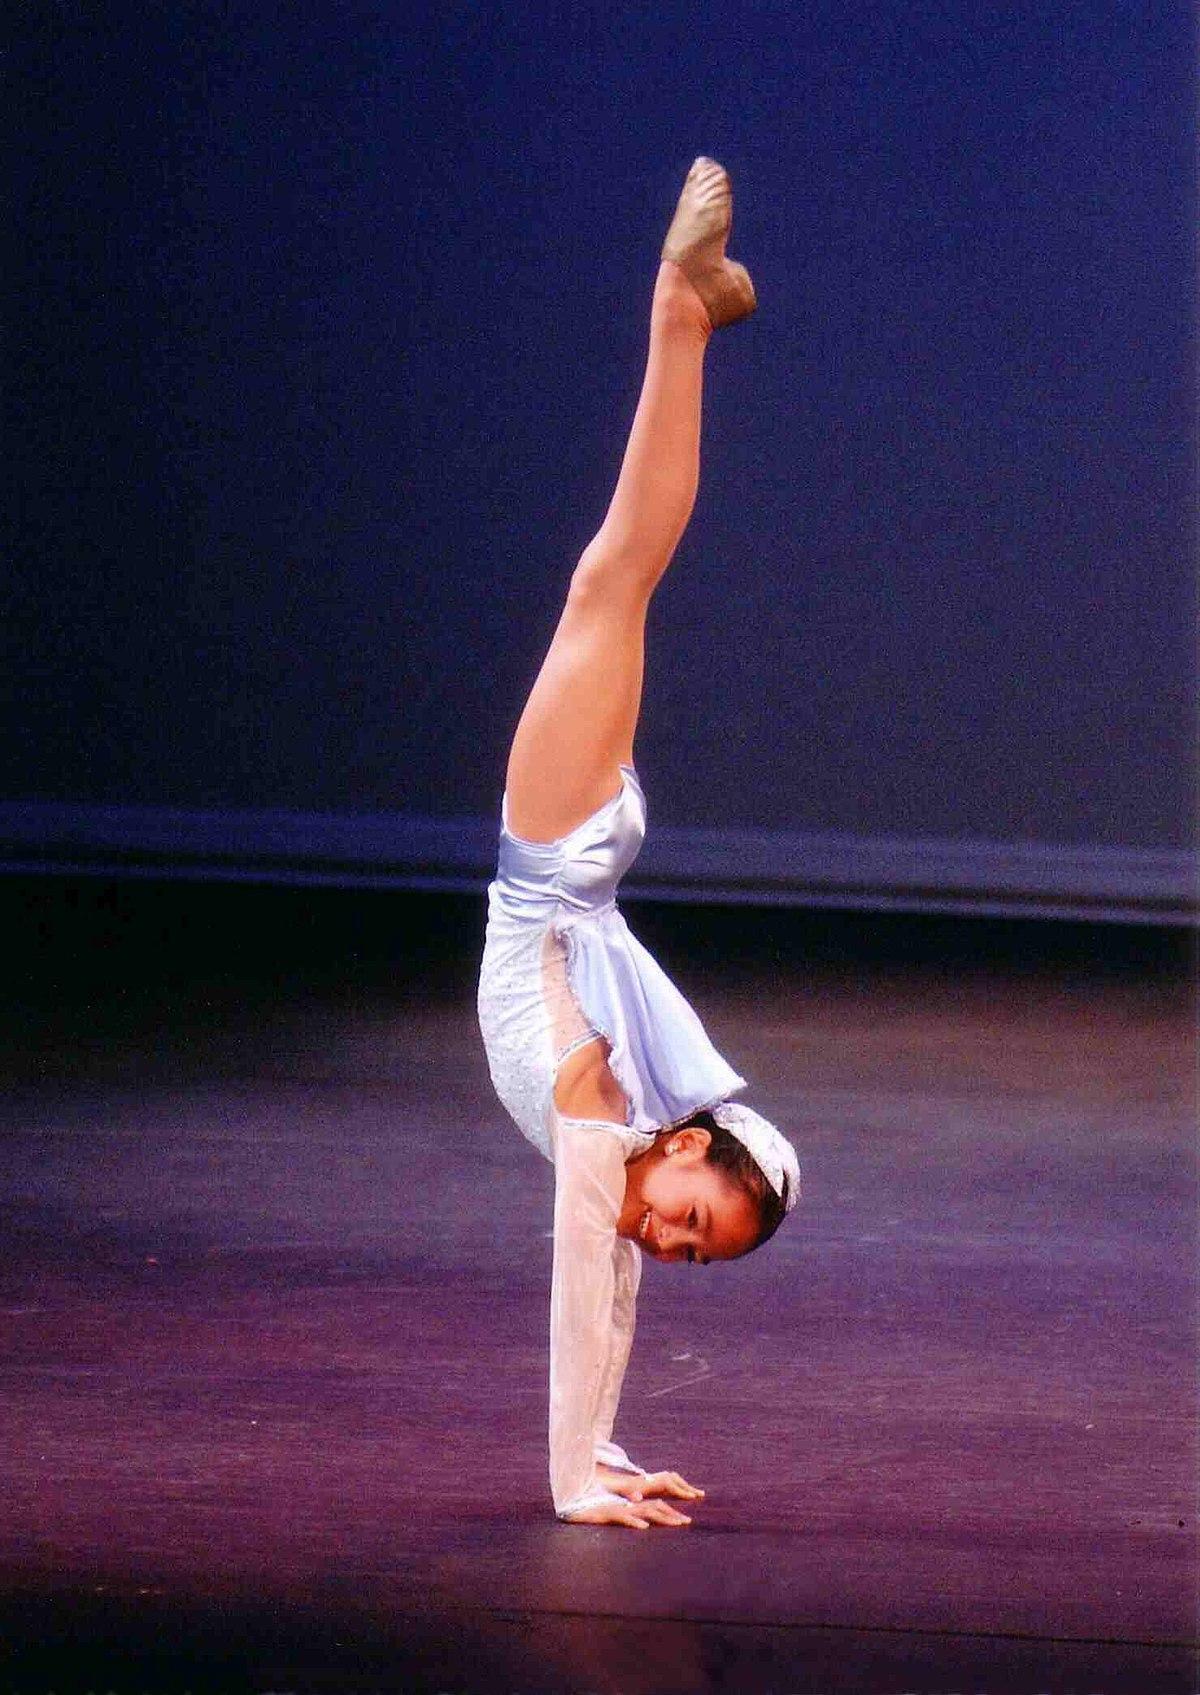 Image forward roll jpg gymnastics wiki - Image Forward Roll Jpg Gymnastics Wiki 10